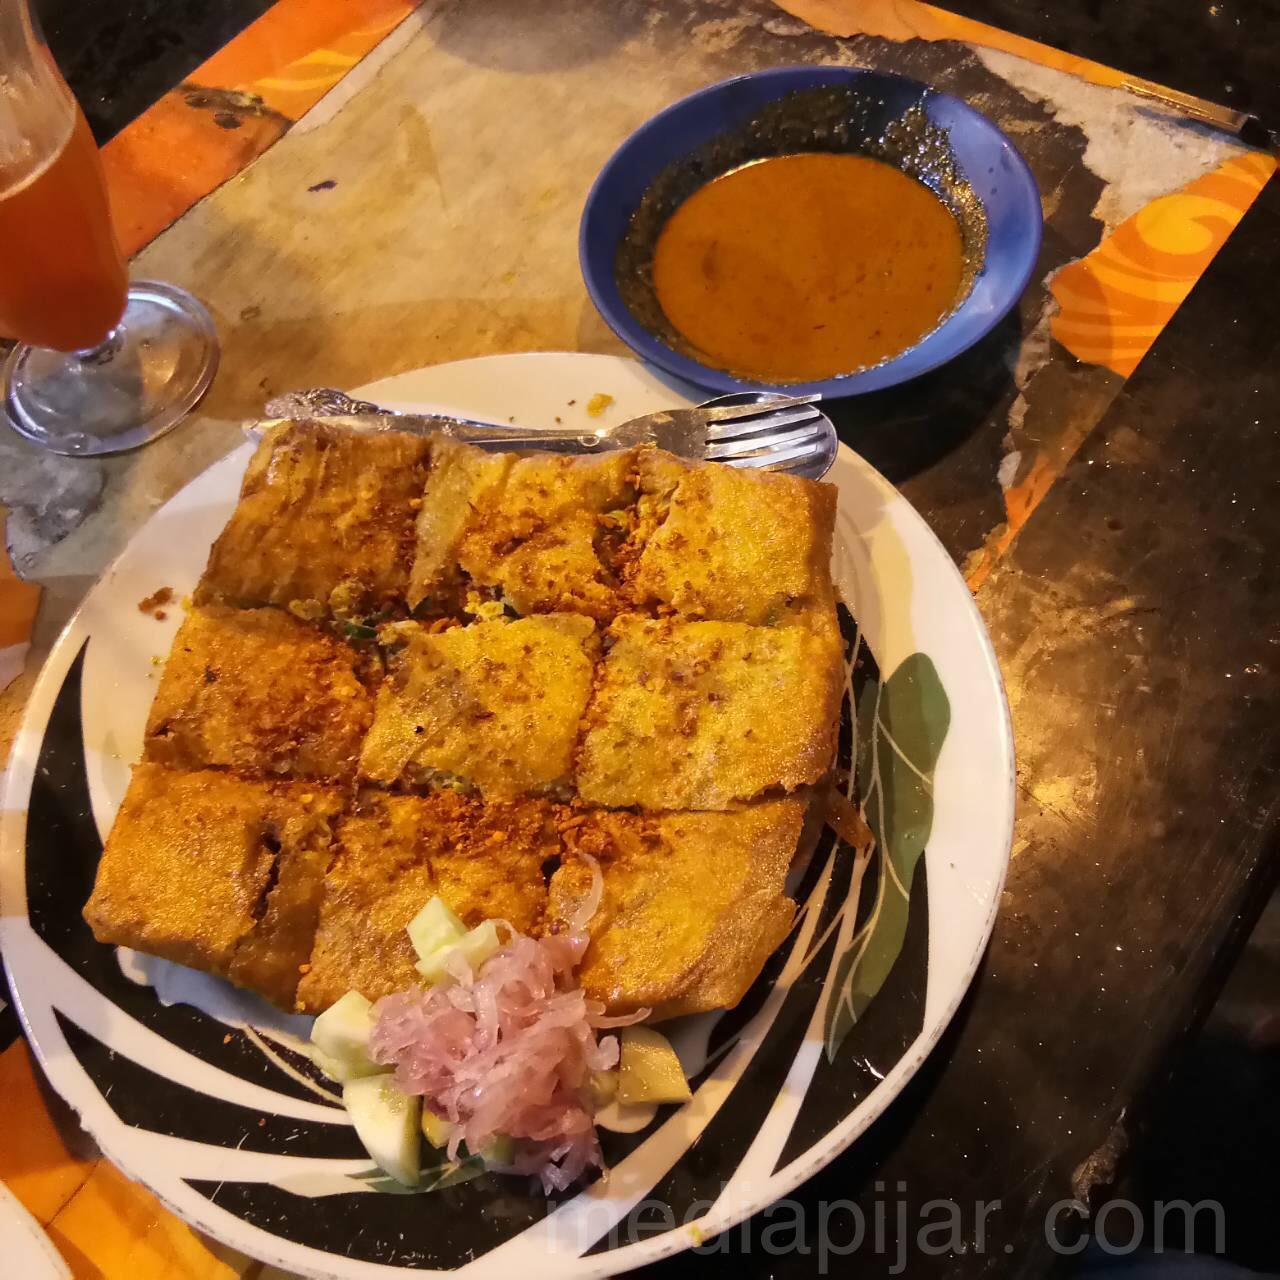 Salah satu sajian menu Martabak di Martabak Horor Medan. (Fotograger: Christian Yosua)